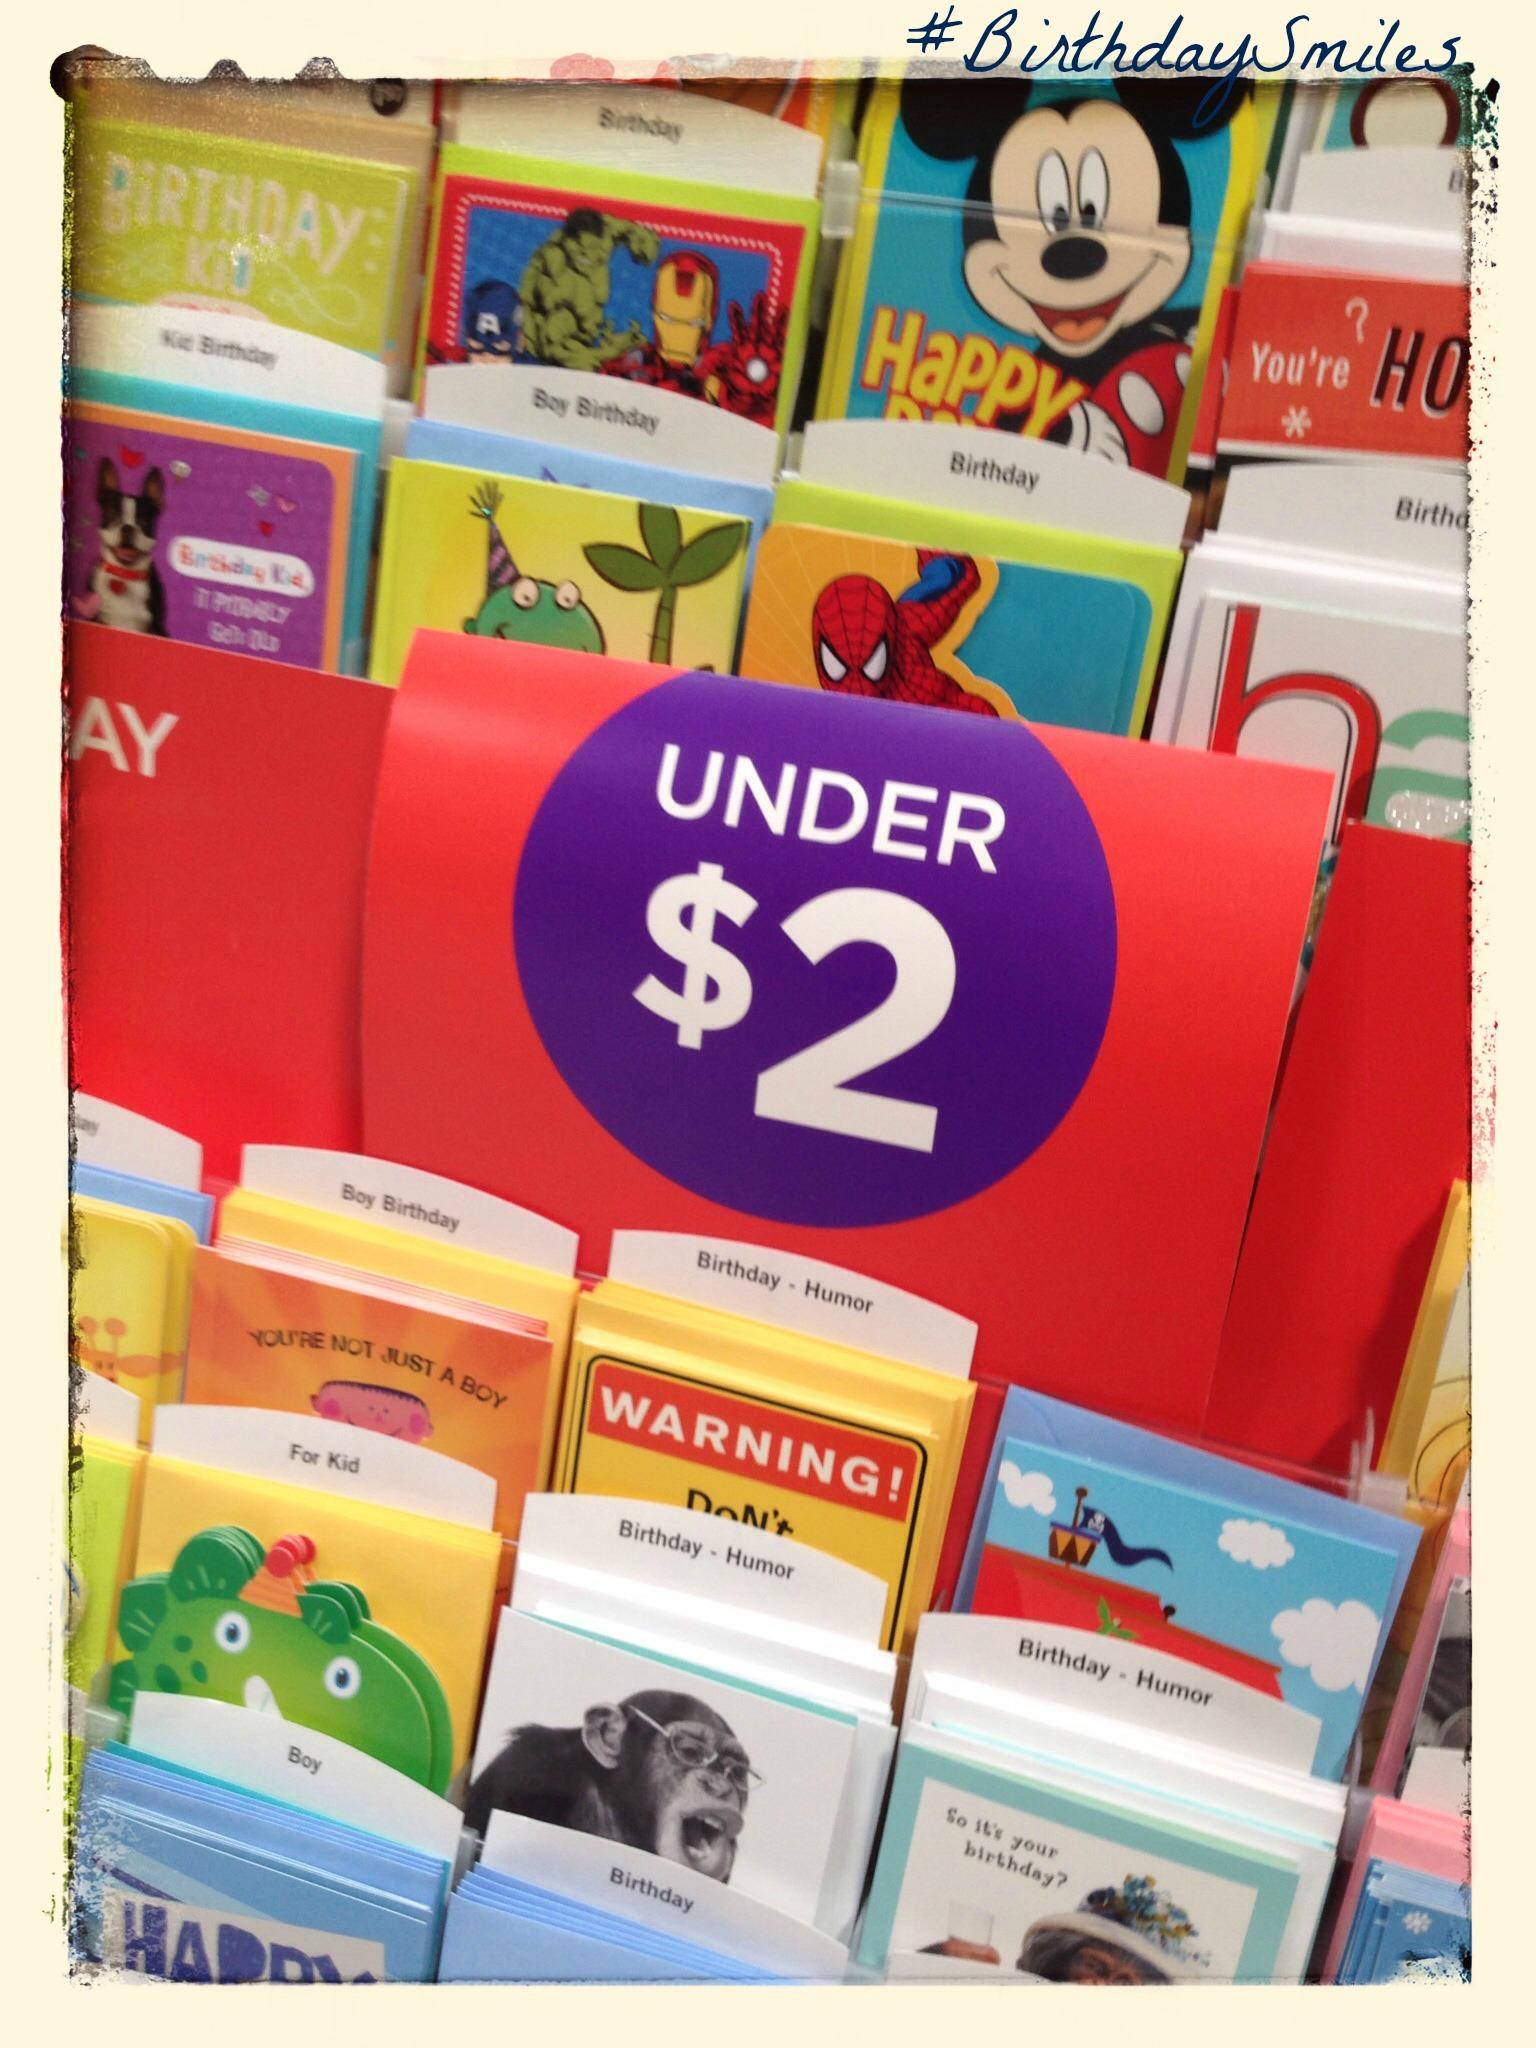 #BirthdaySmiles #shop #cbias CBG191310 Hallmark ClassyBlackGirl Calendar REAL two bucks REAL